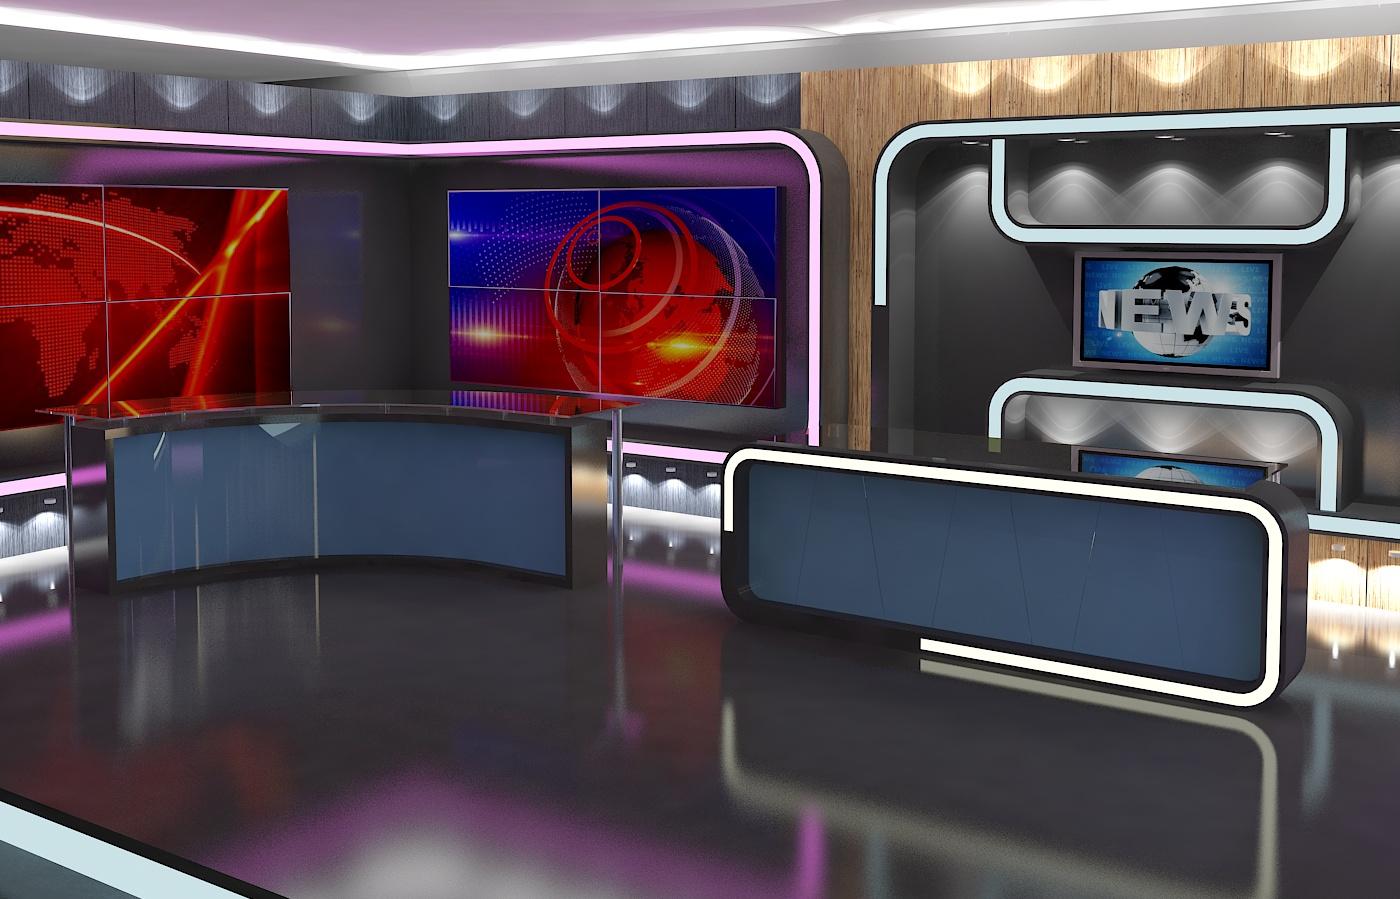 virtual tv studio news set 16 3d model 3ds max dxf fbx obj 223690